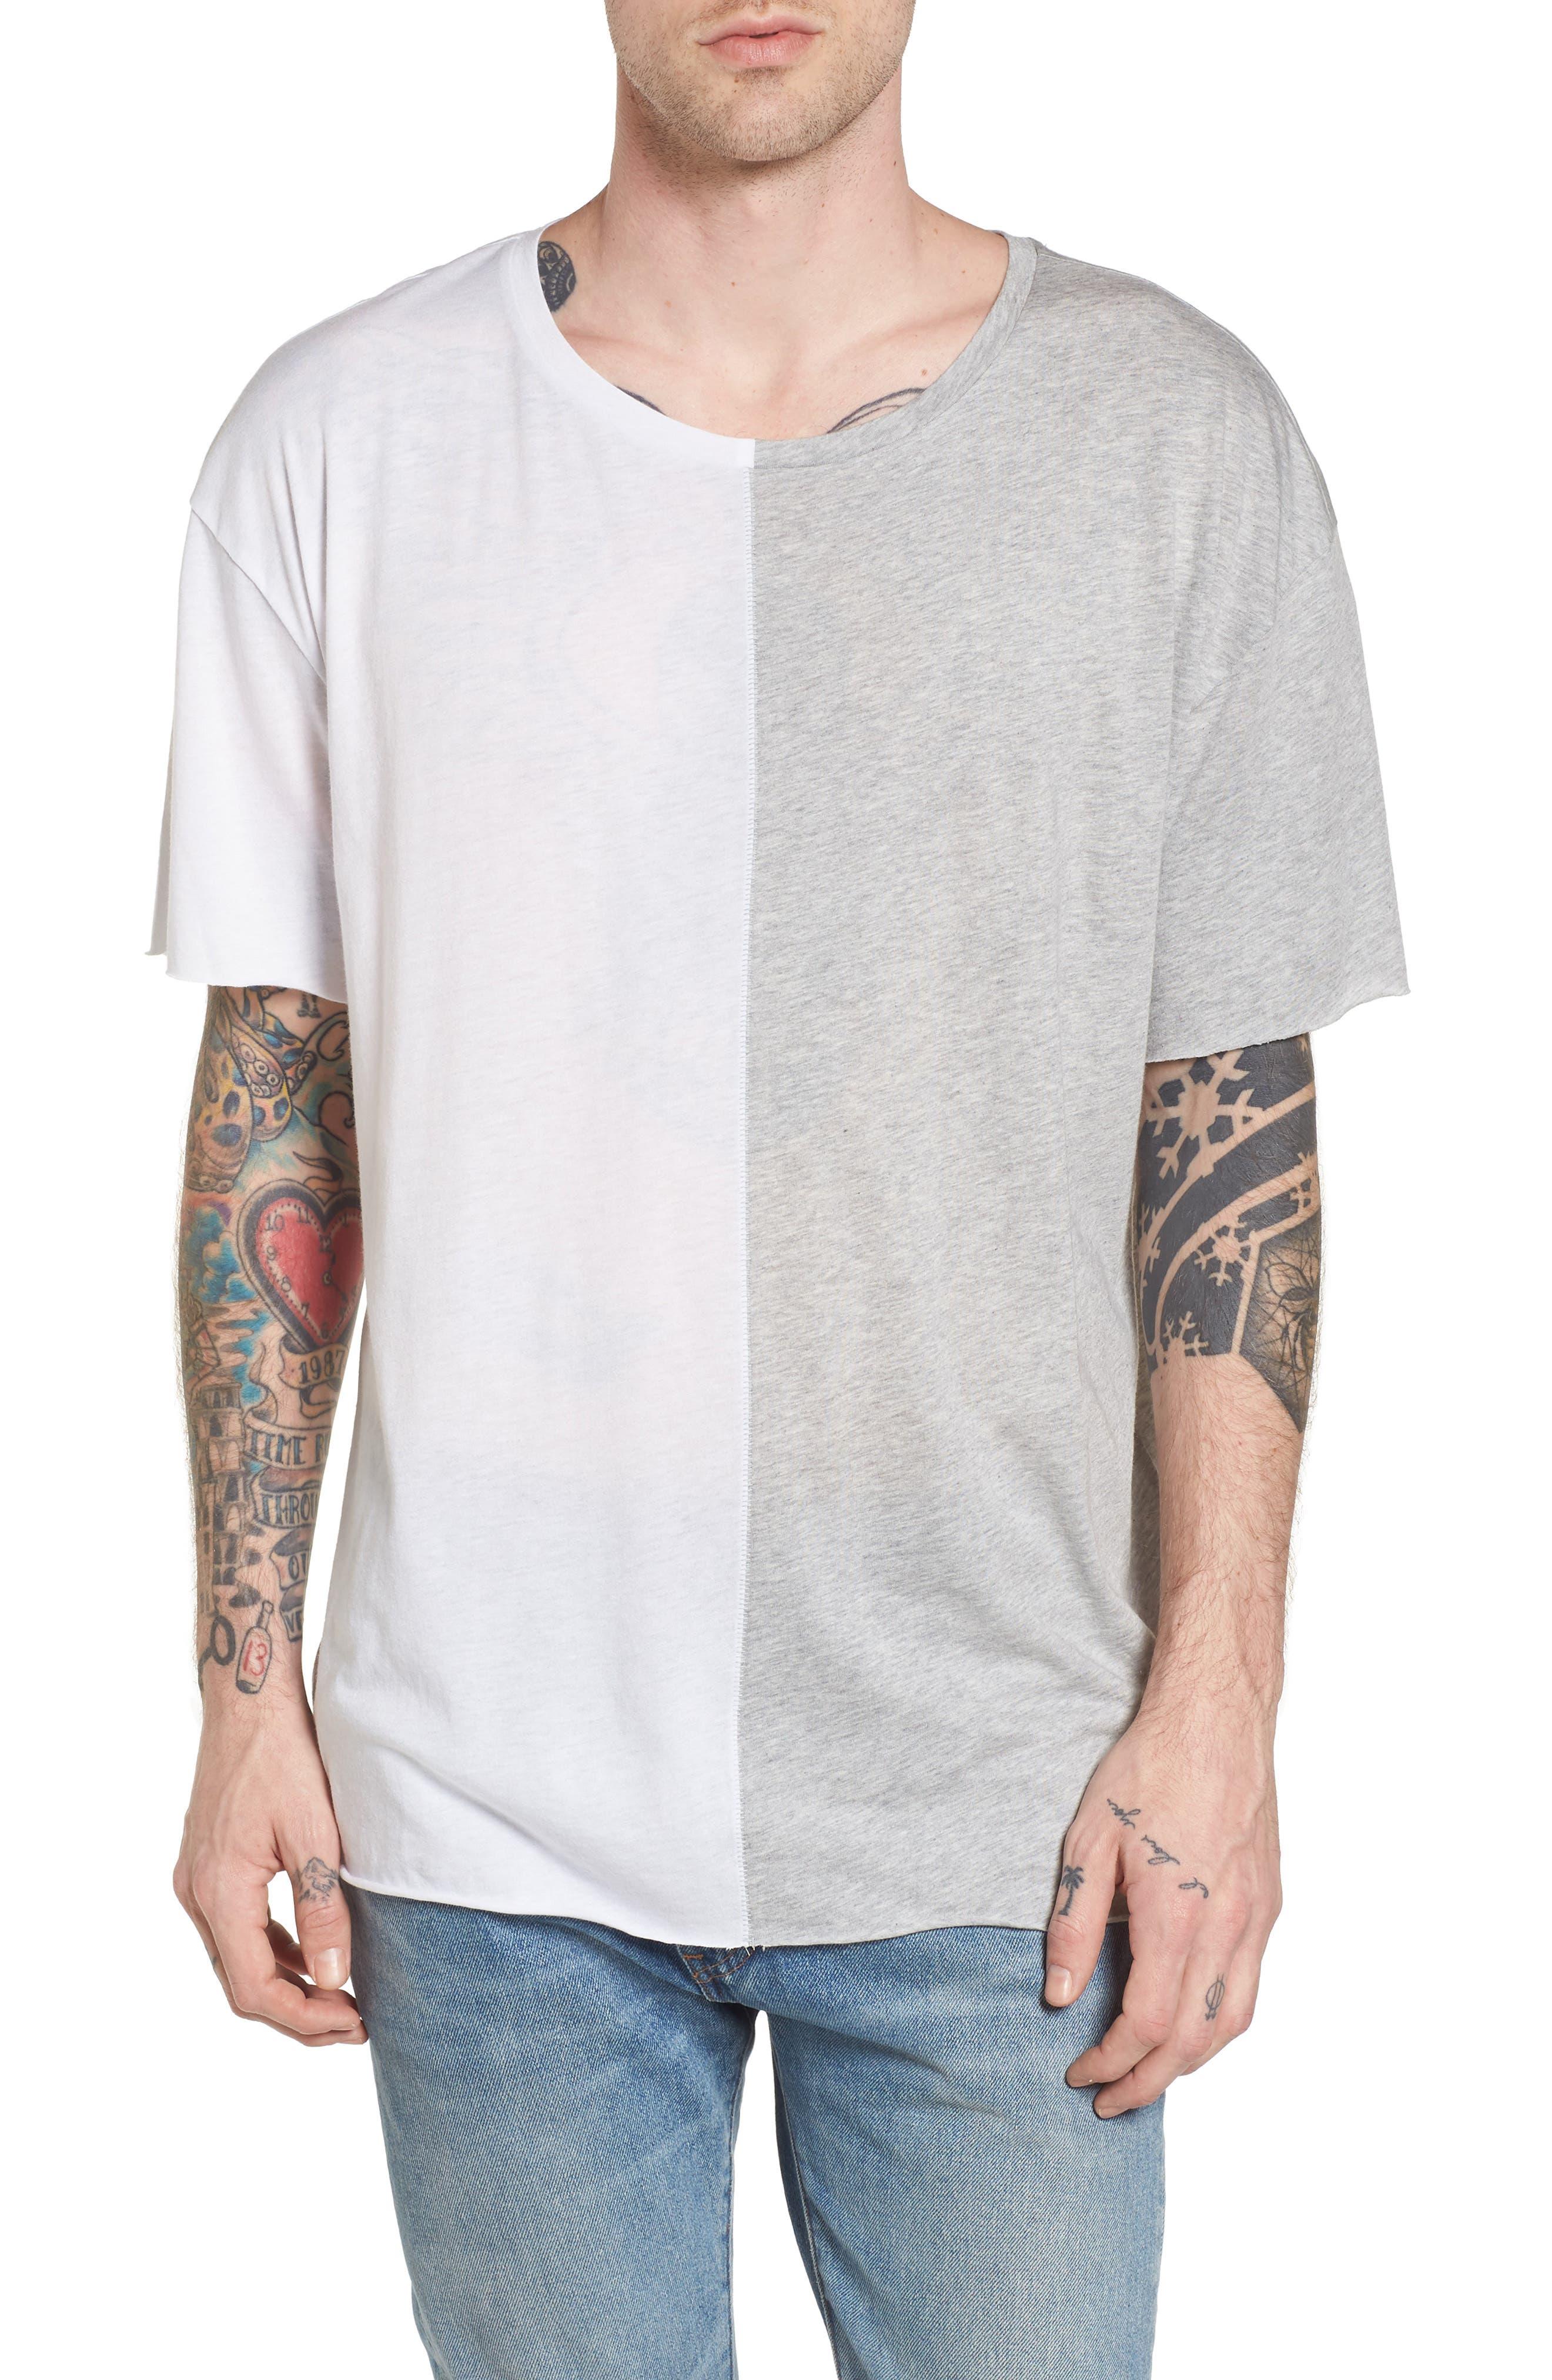 Boxy Splice T-Shirt,                         Main,                         color, White/ Grey Heather